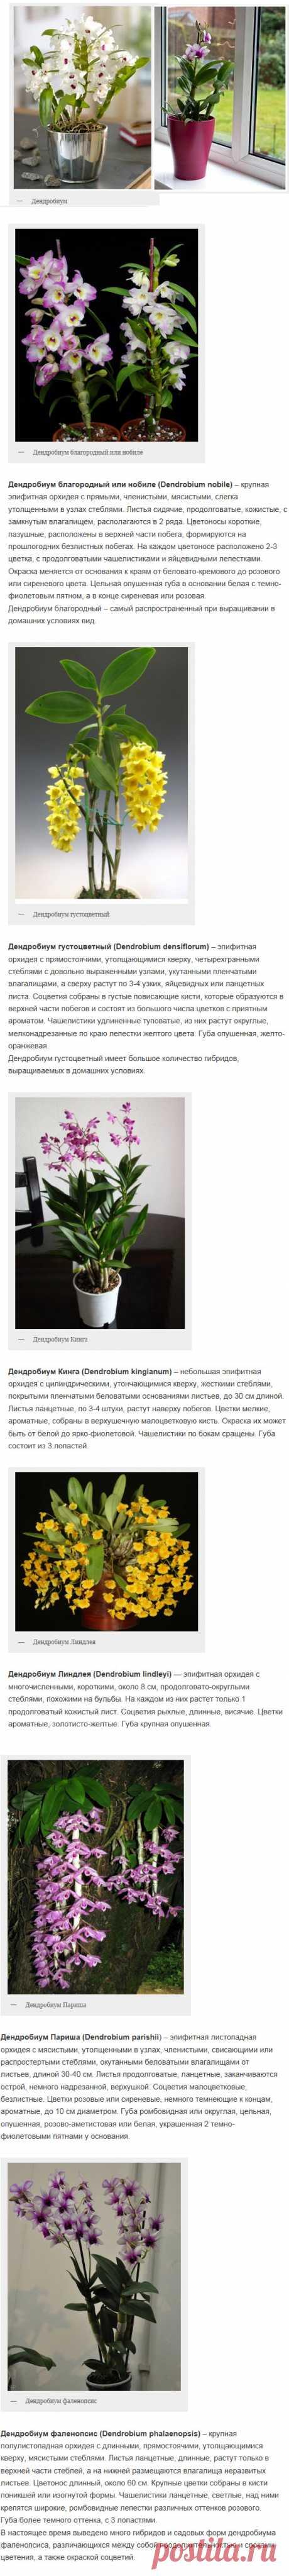 Орхидея дендробиум. Фото, домашний уход за цветком | uhod-v-domashnih-usloviyah